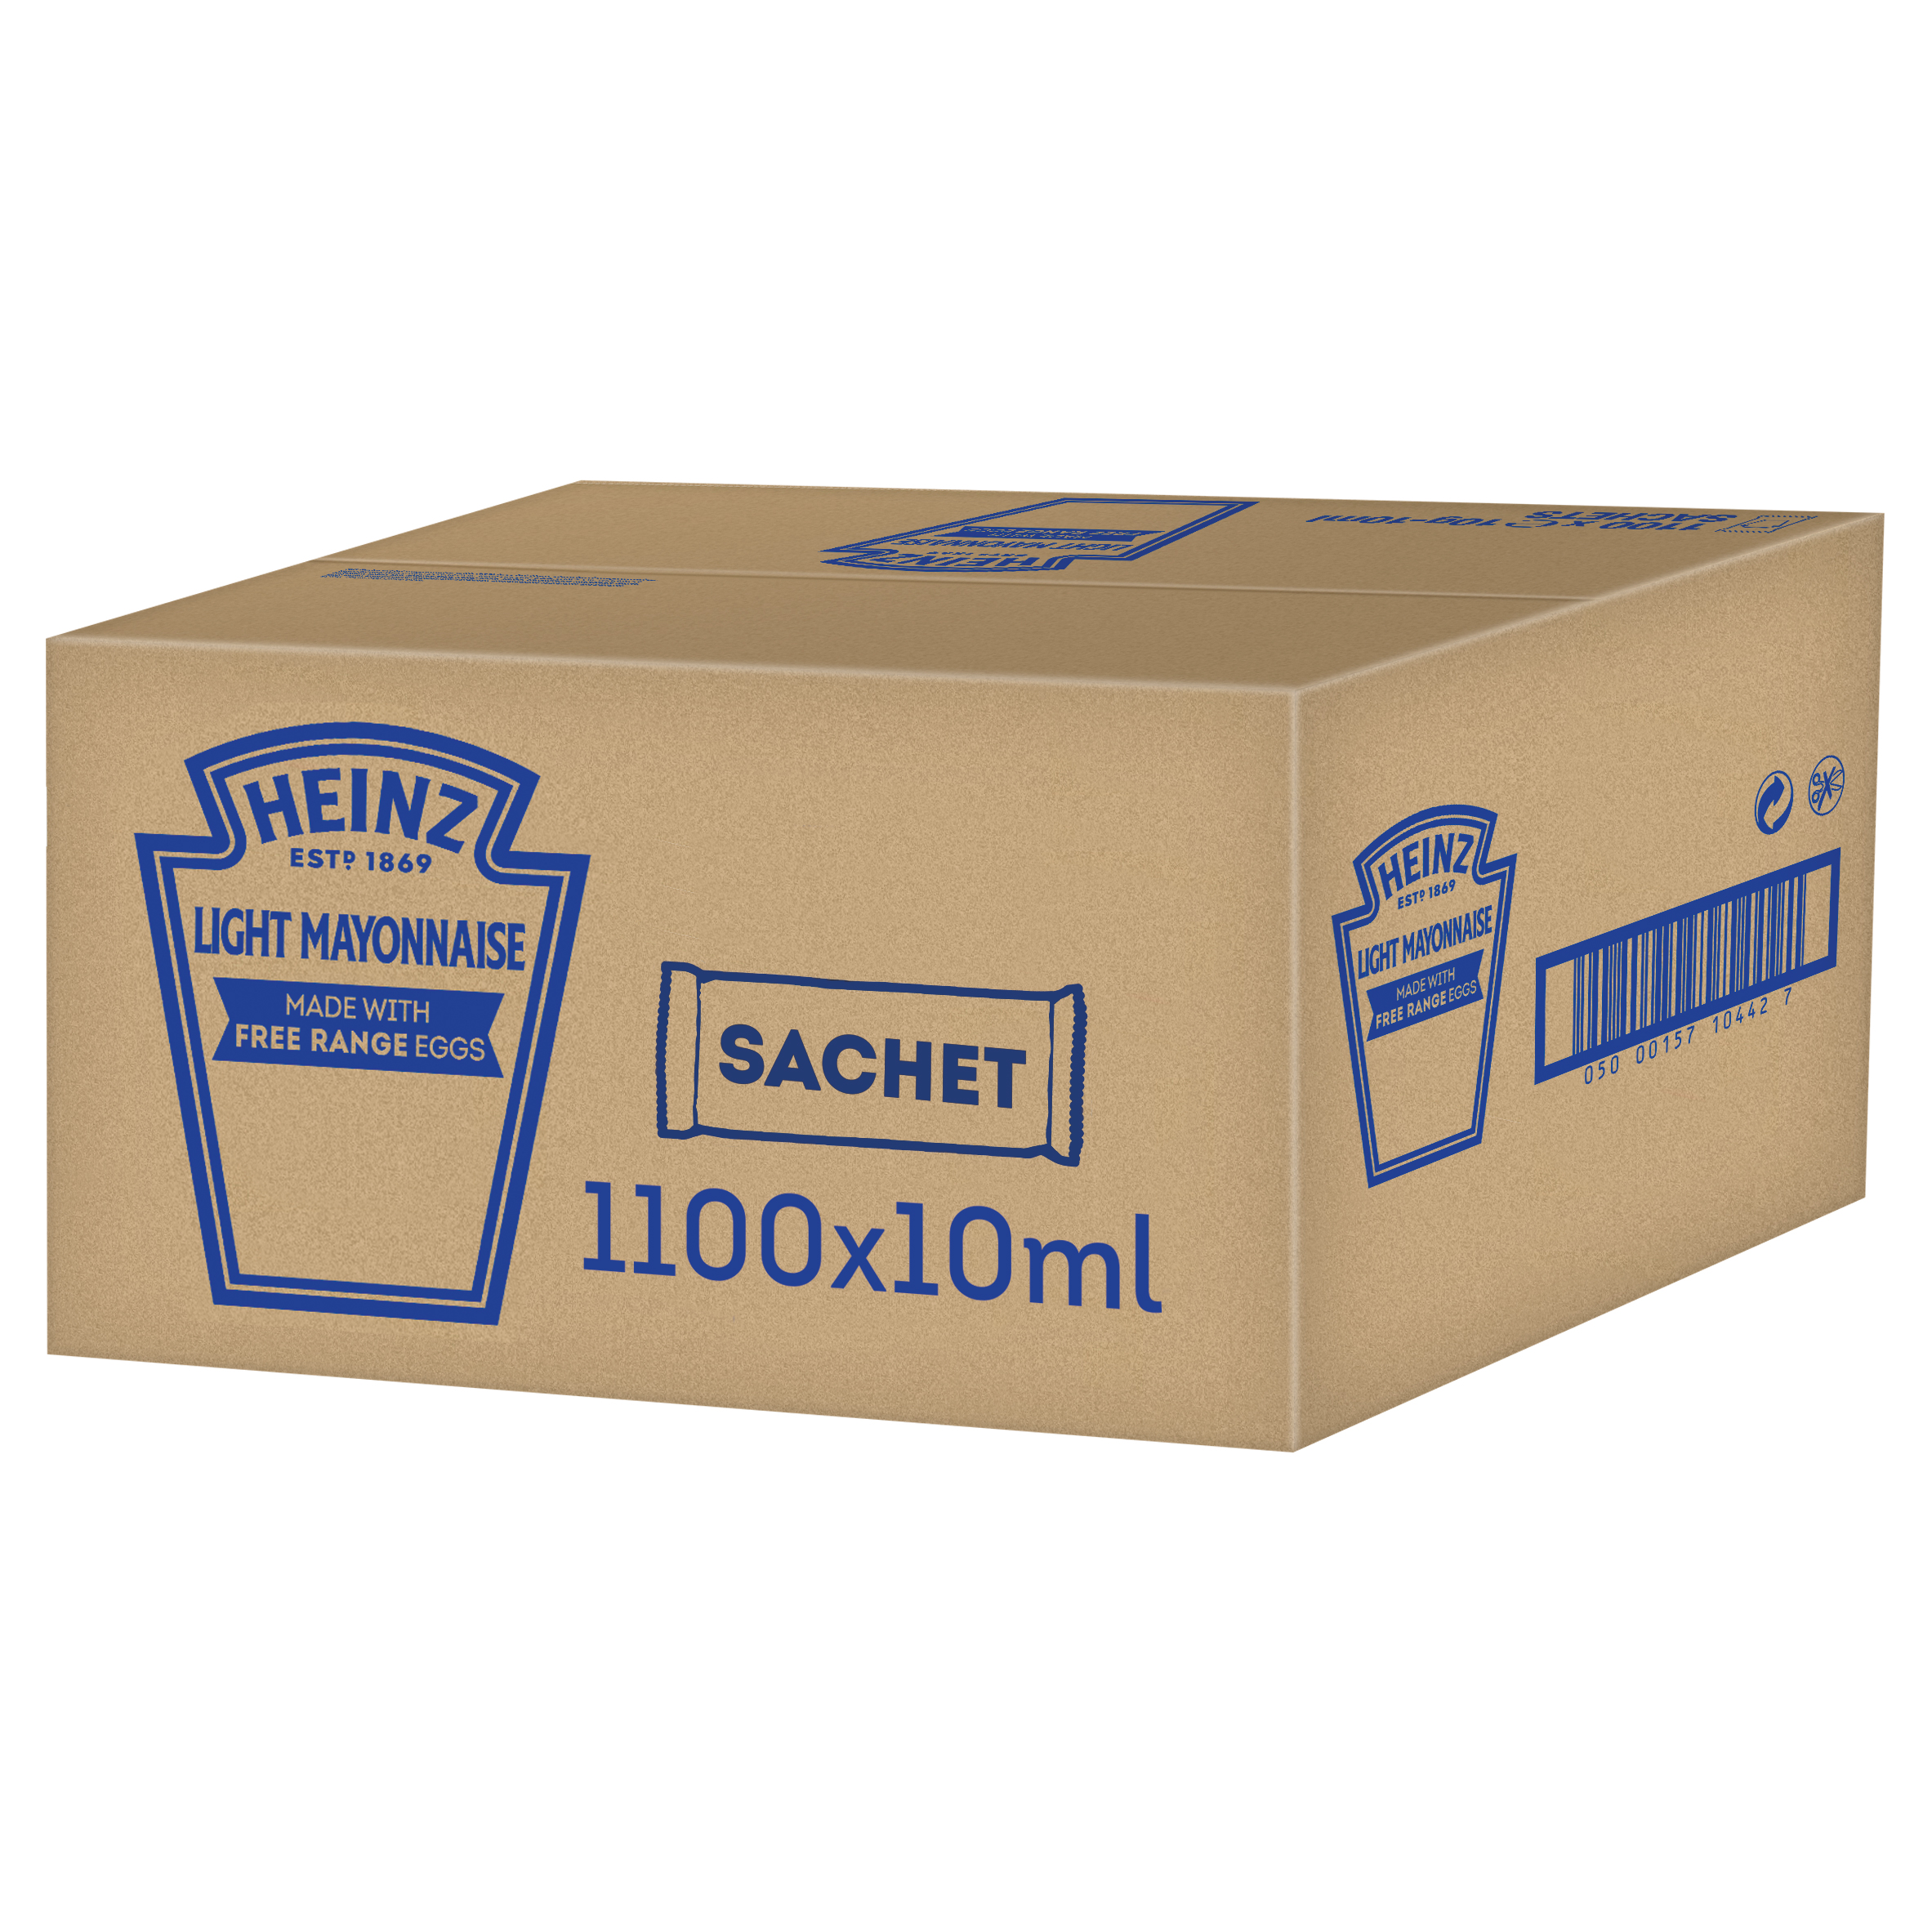 Heinz Mayonnaise Light 10ml Sachet